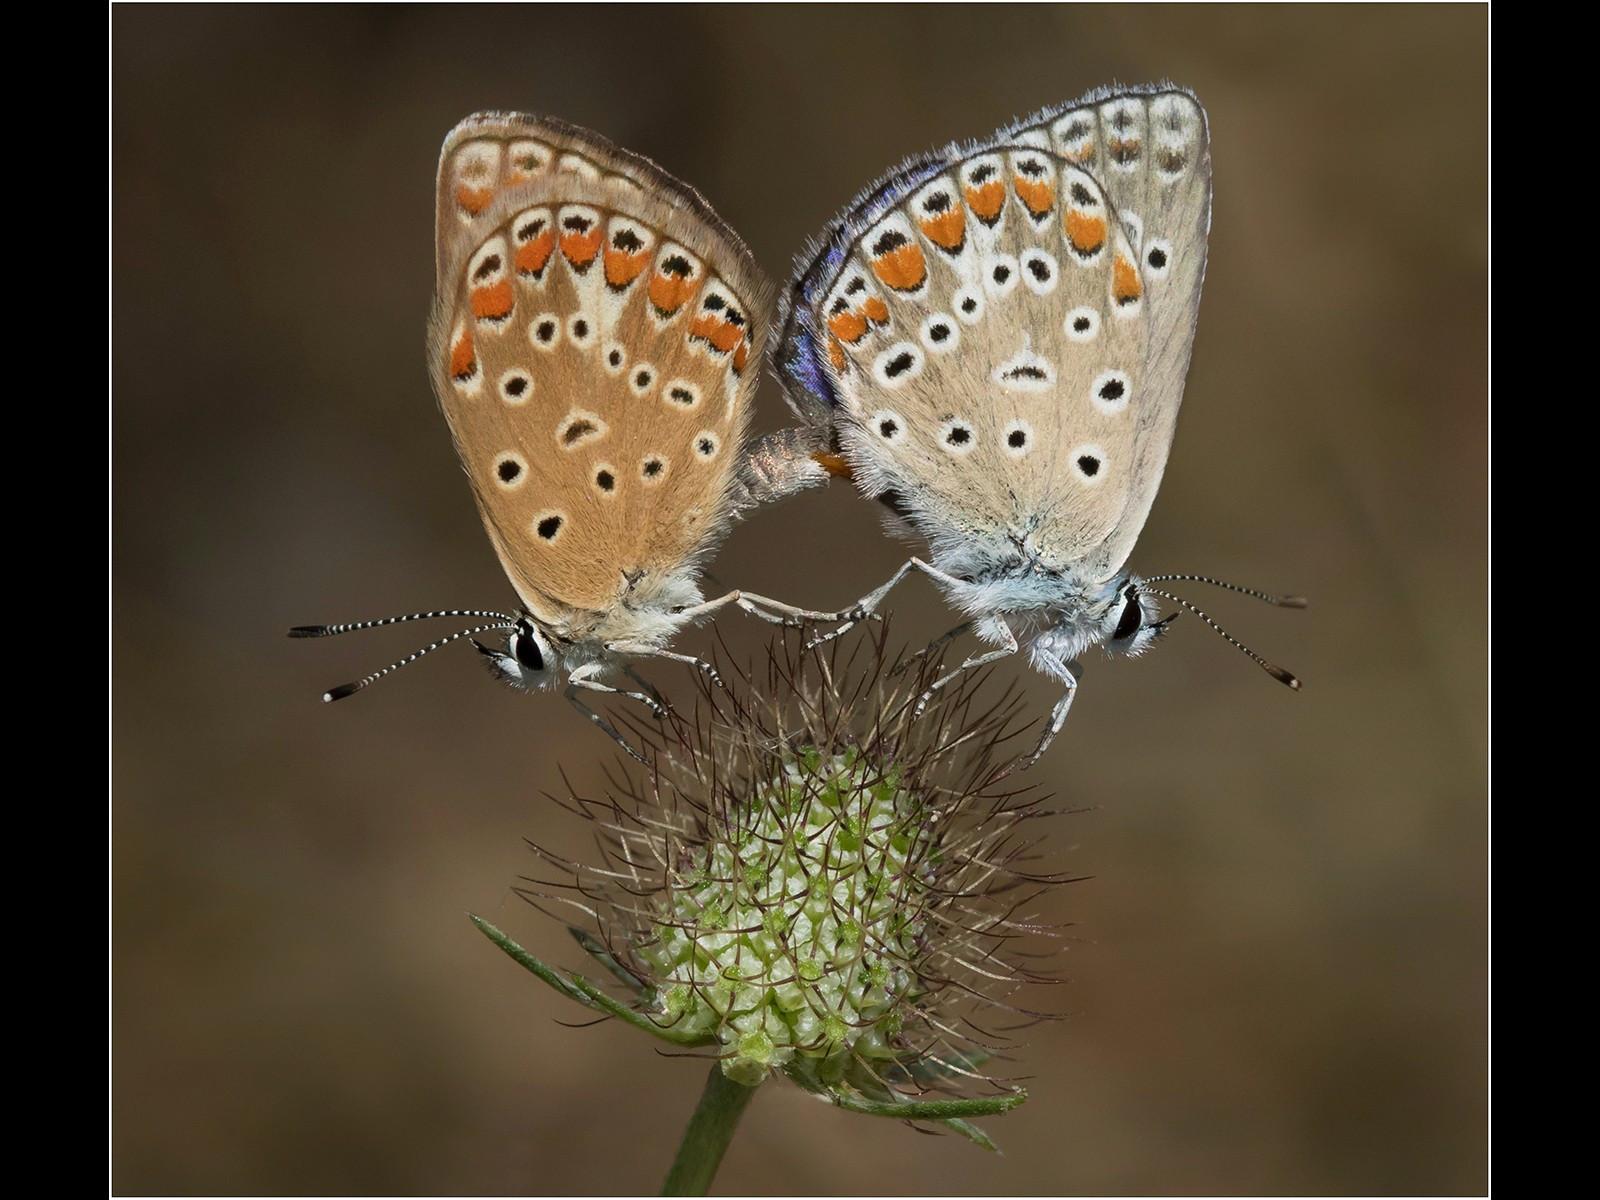 Common Blue Butterflies - Mating